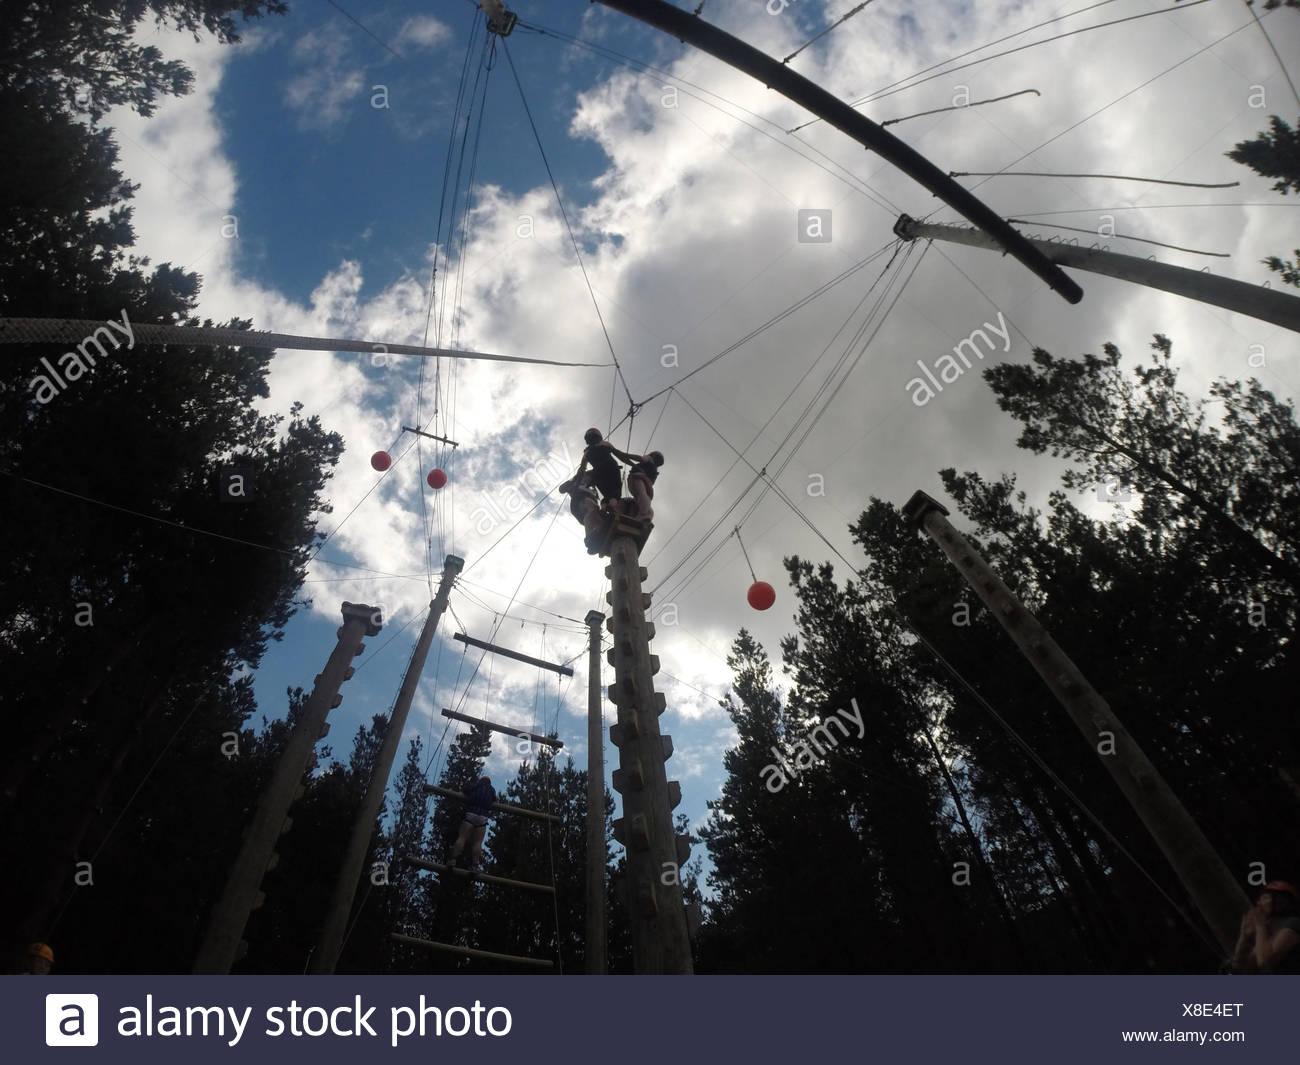 People Slick Lining In Slacklining Park - Stock Image